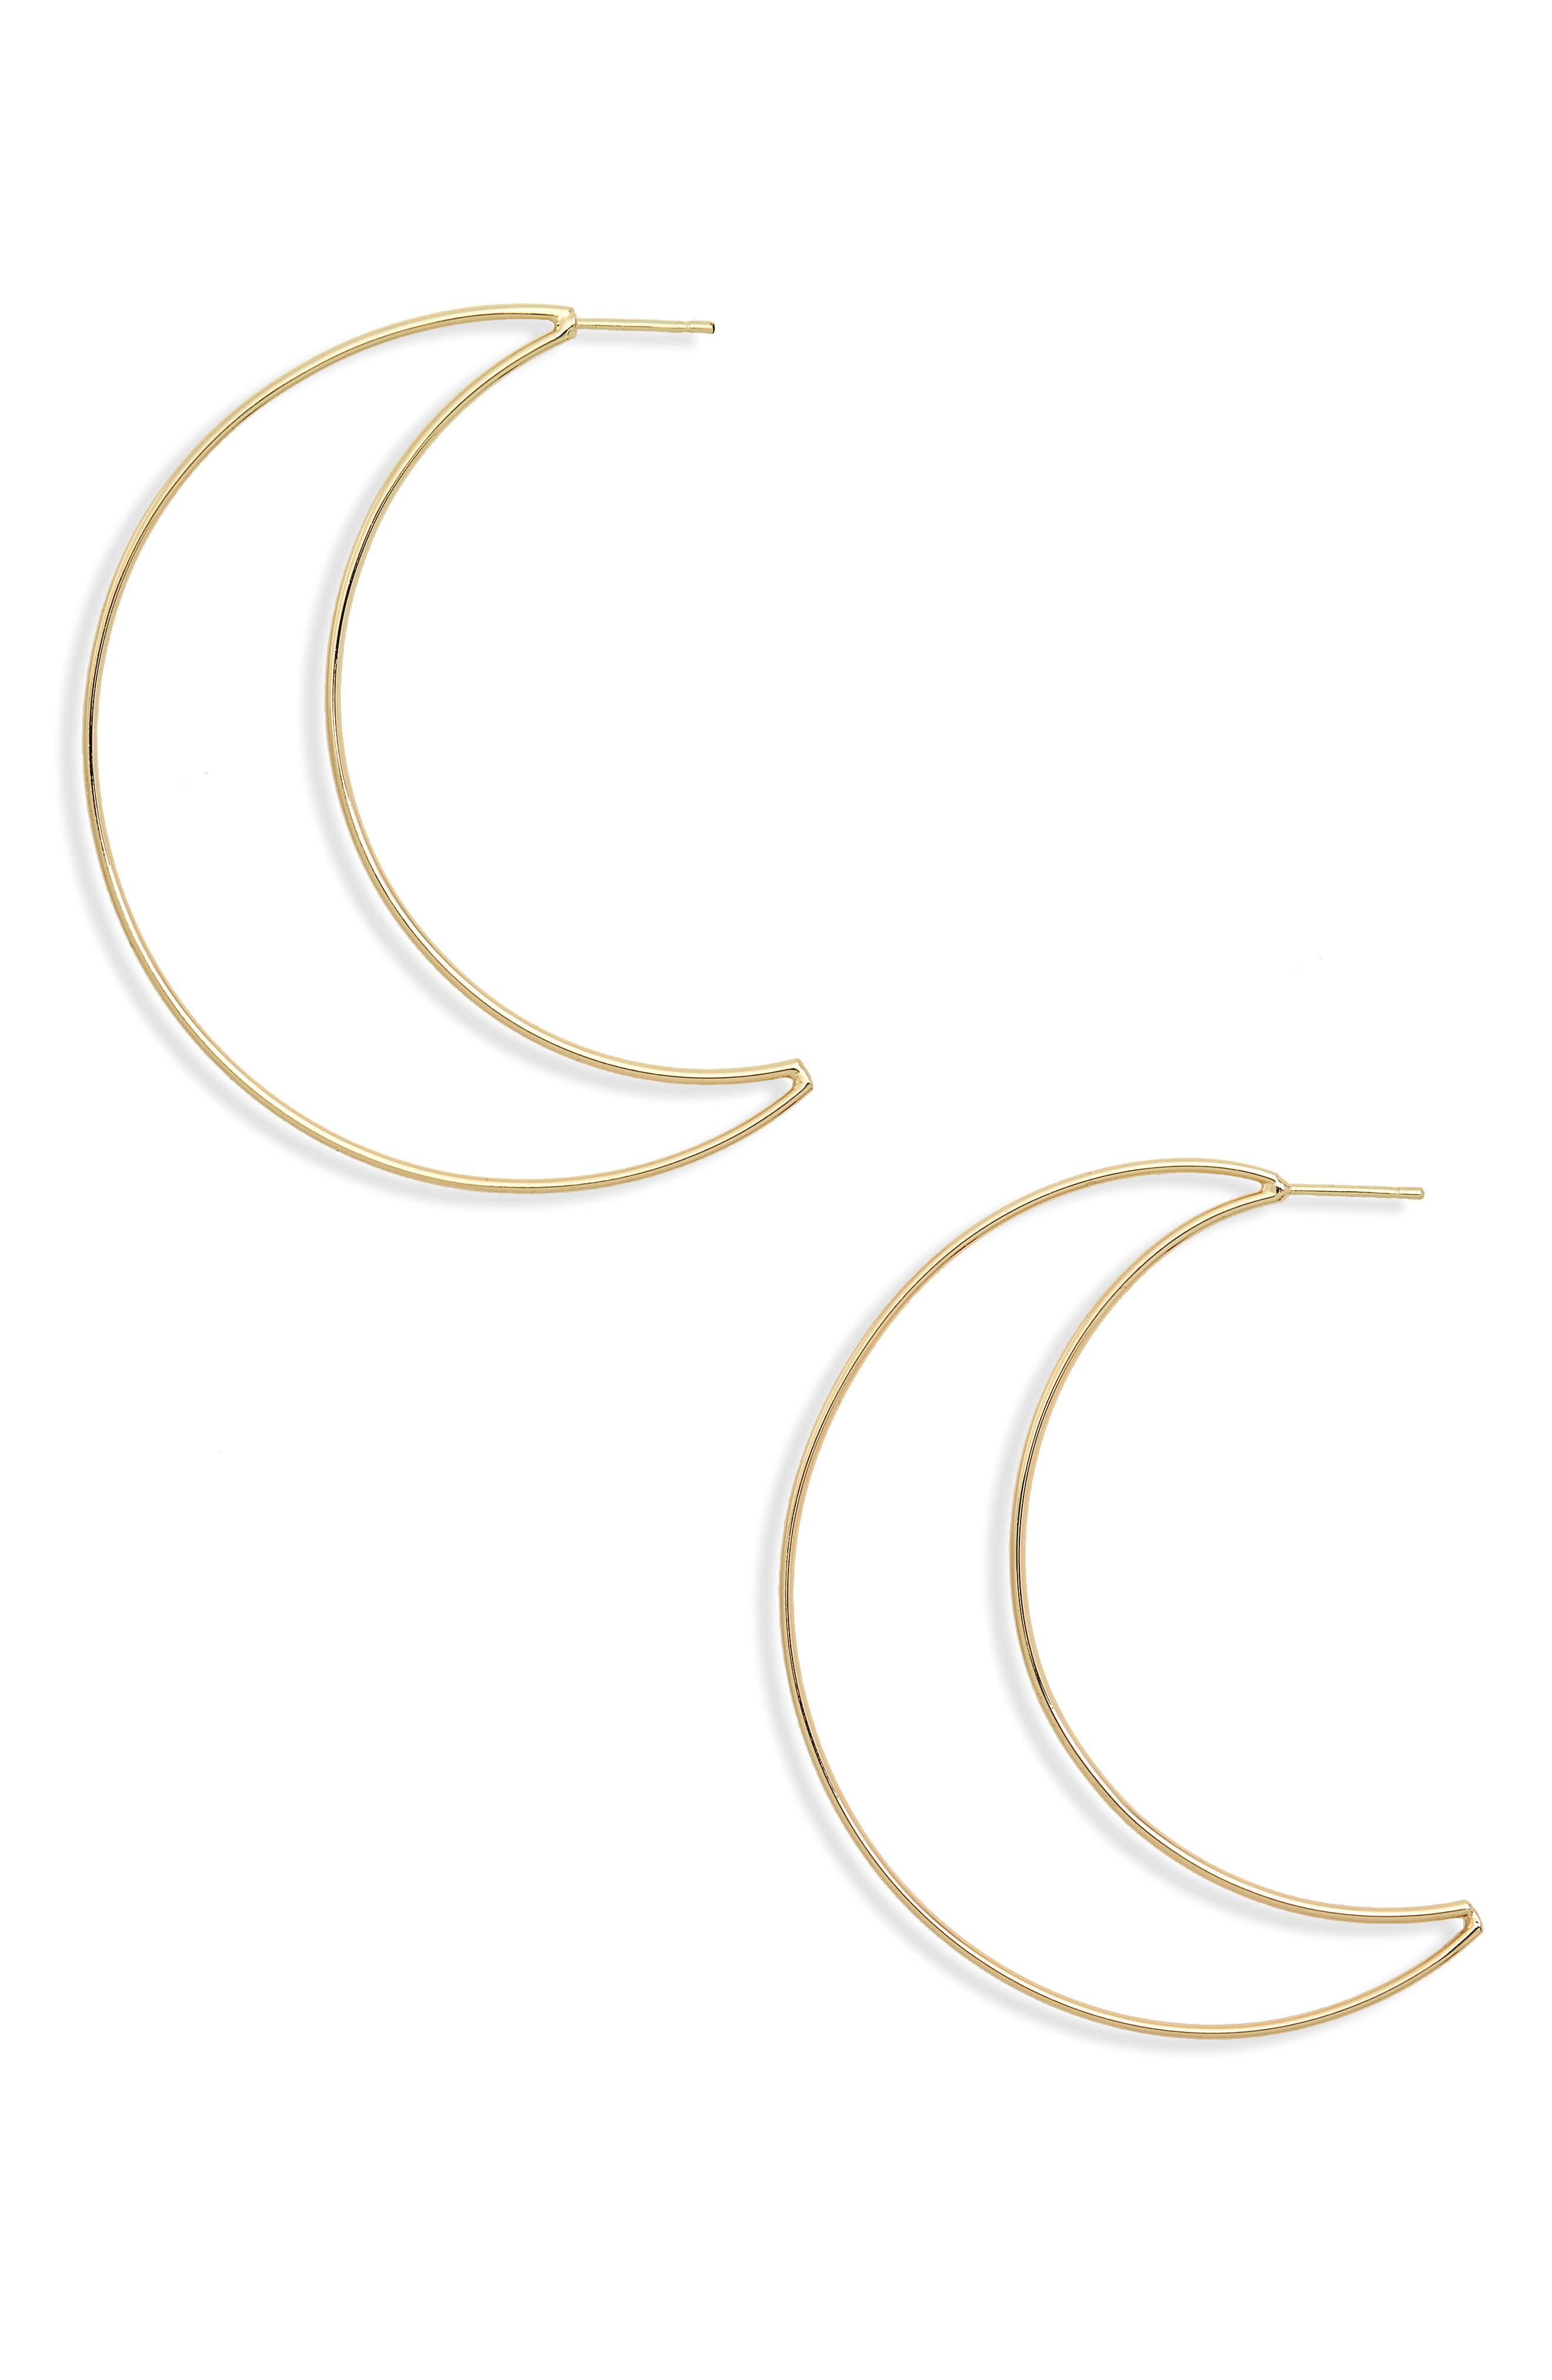 Crescent Hoop Earrings,                             Main thumbnail 1, color,                             Yellow Gold